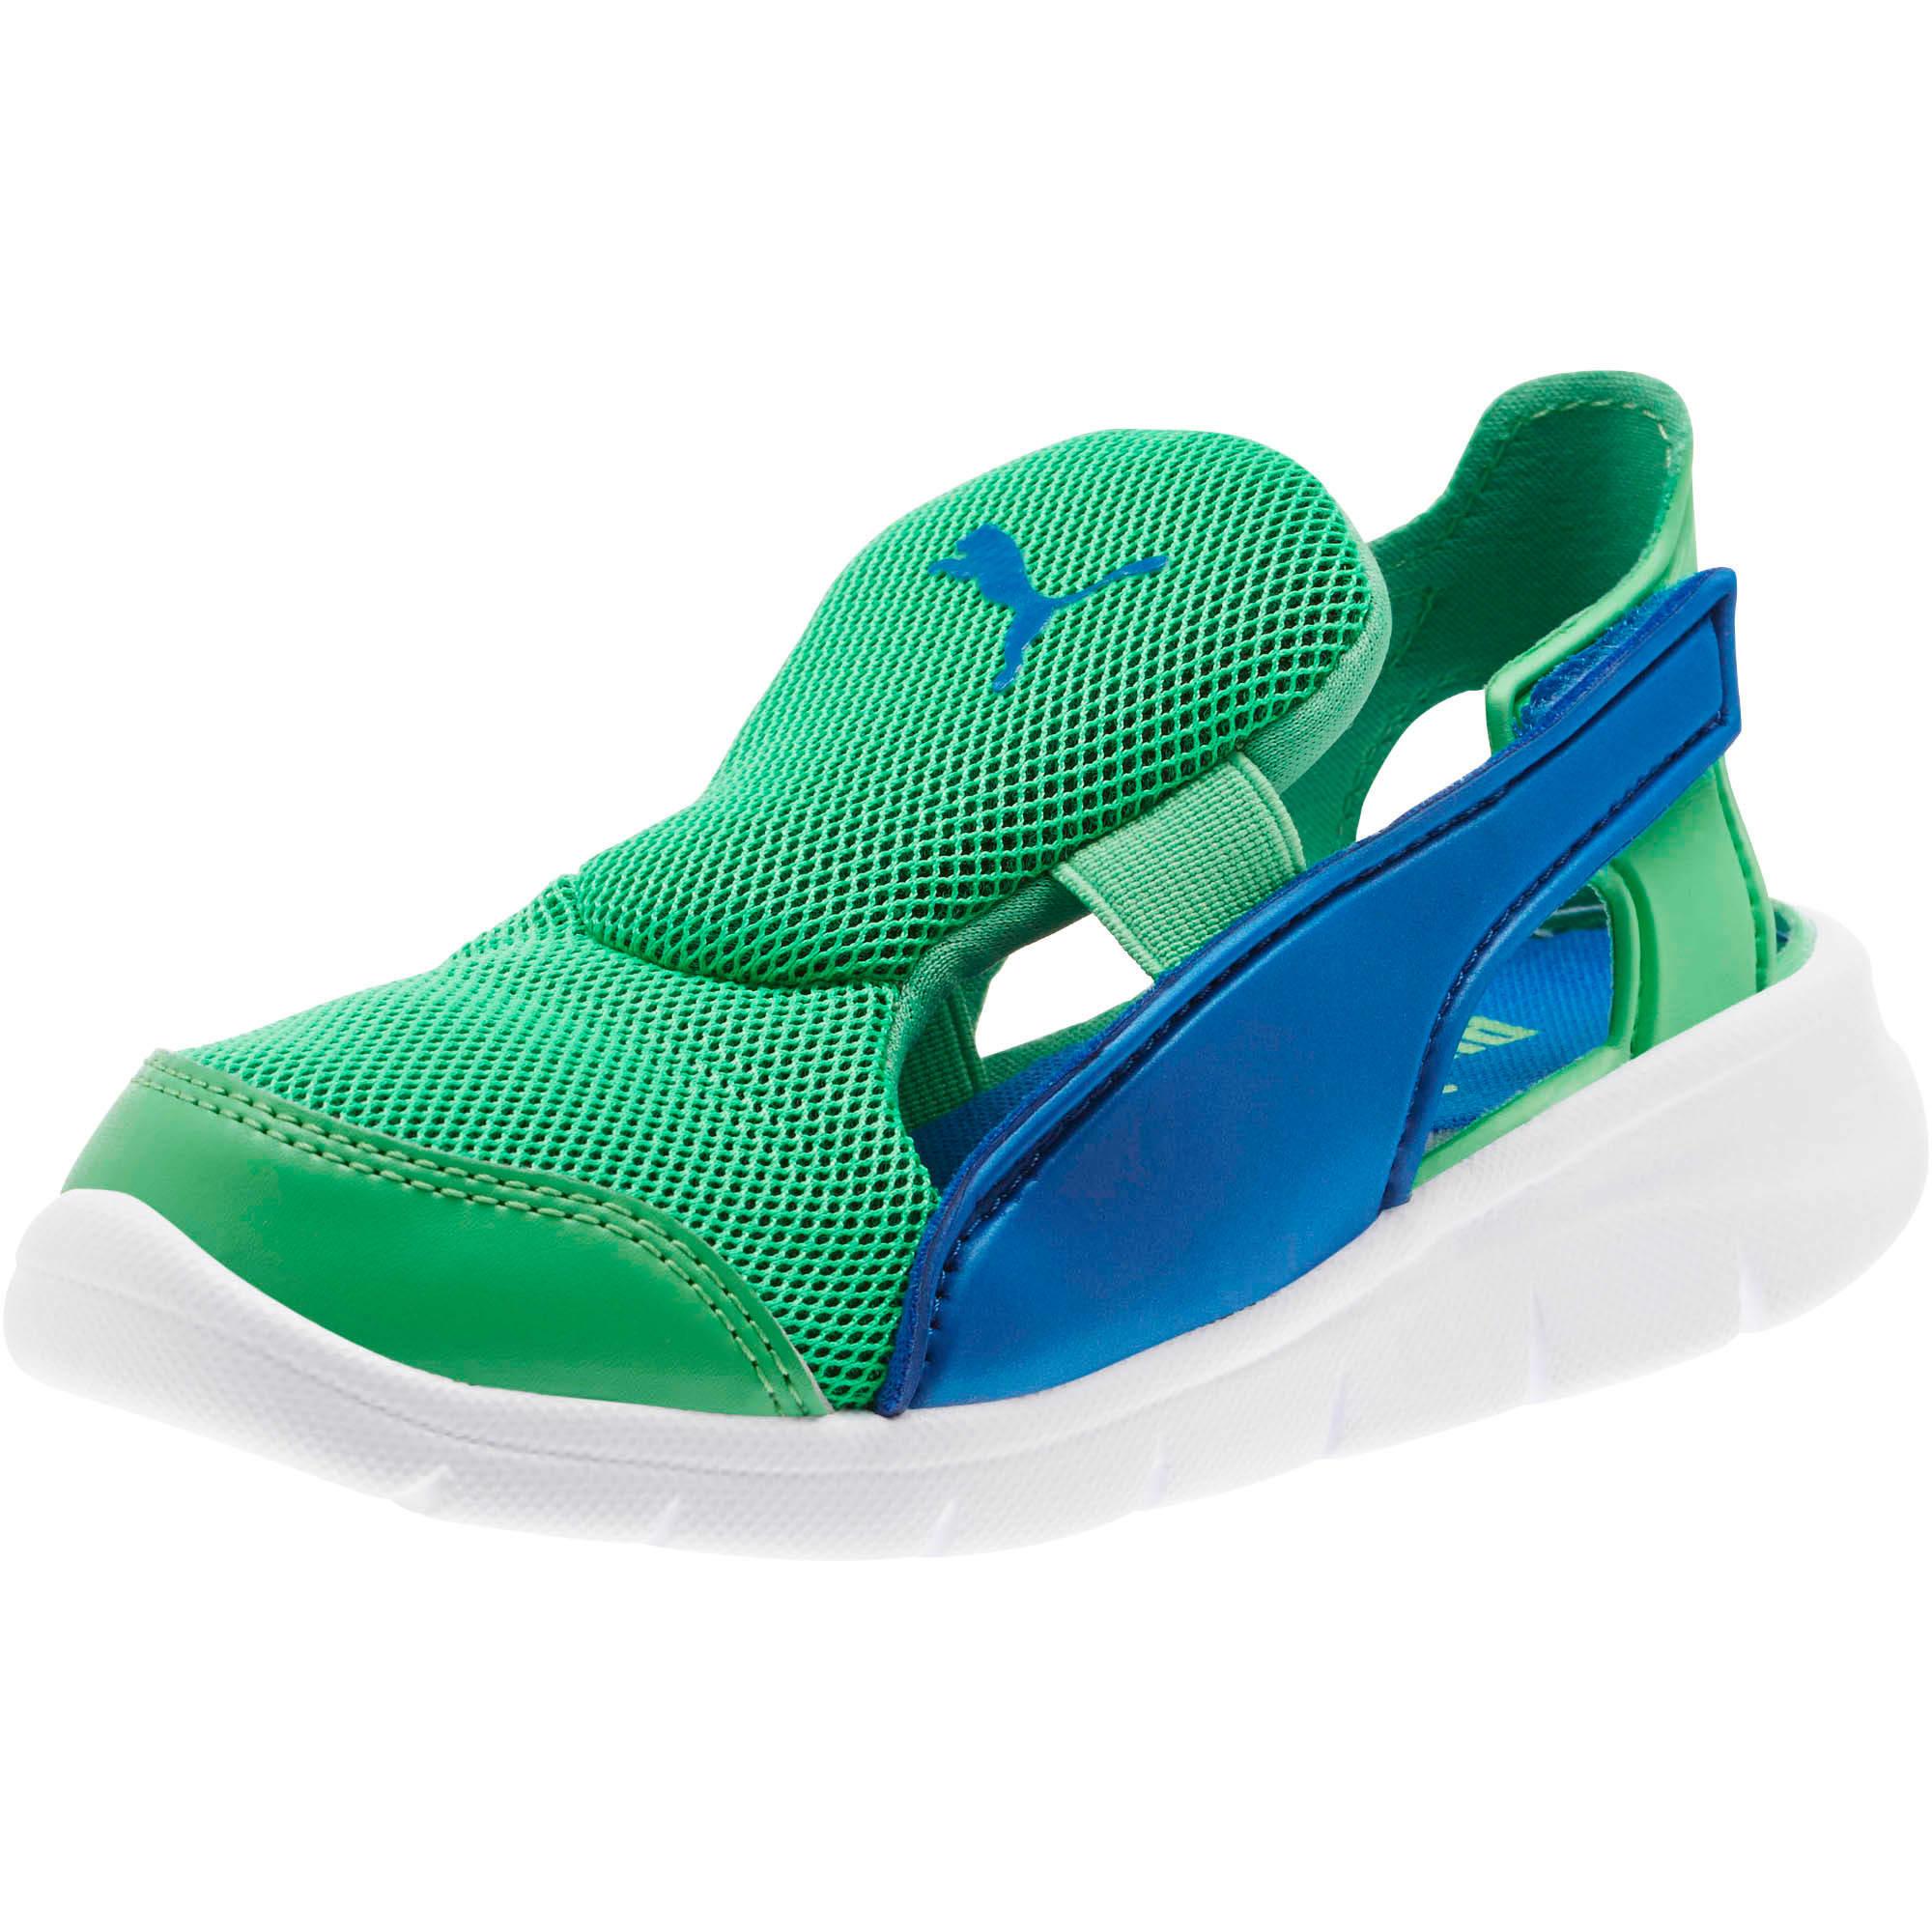 Thumbnail 1 of Bao 3 Open Little Kids' Shoes, Surf The Web-Irish Green, medium